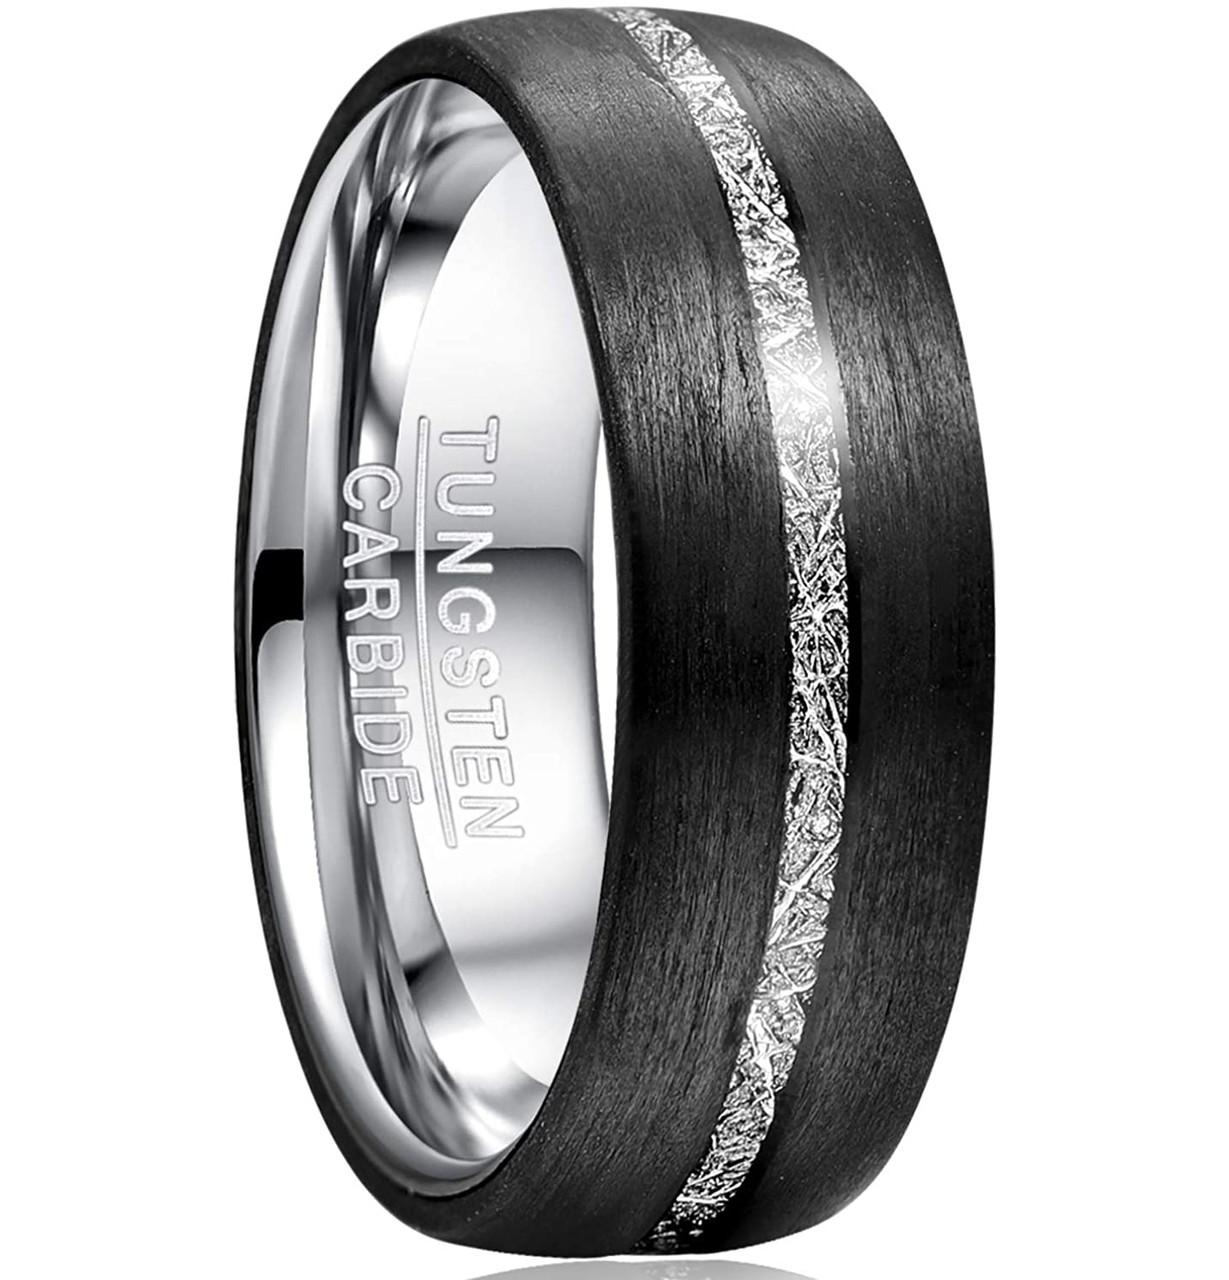 Tungsten Wedding Band Mens Wedding Band Ring 8mm Wedding Band Ring Unisex Wedding Band Polished Tungsten Silver Ring Mens Wedding Band Ring